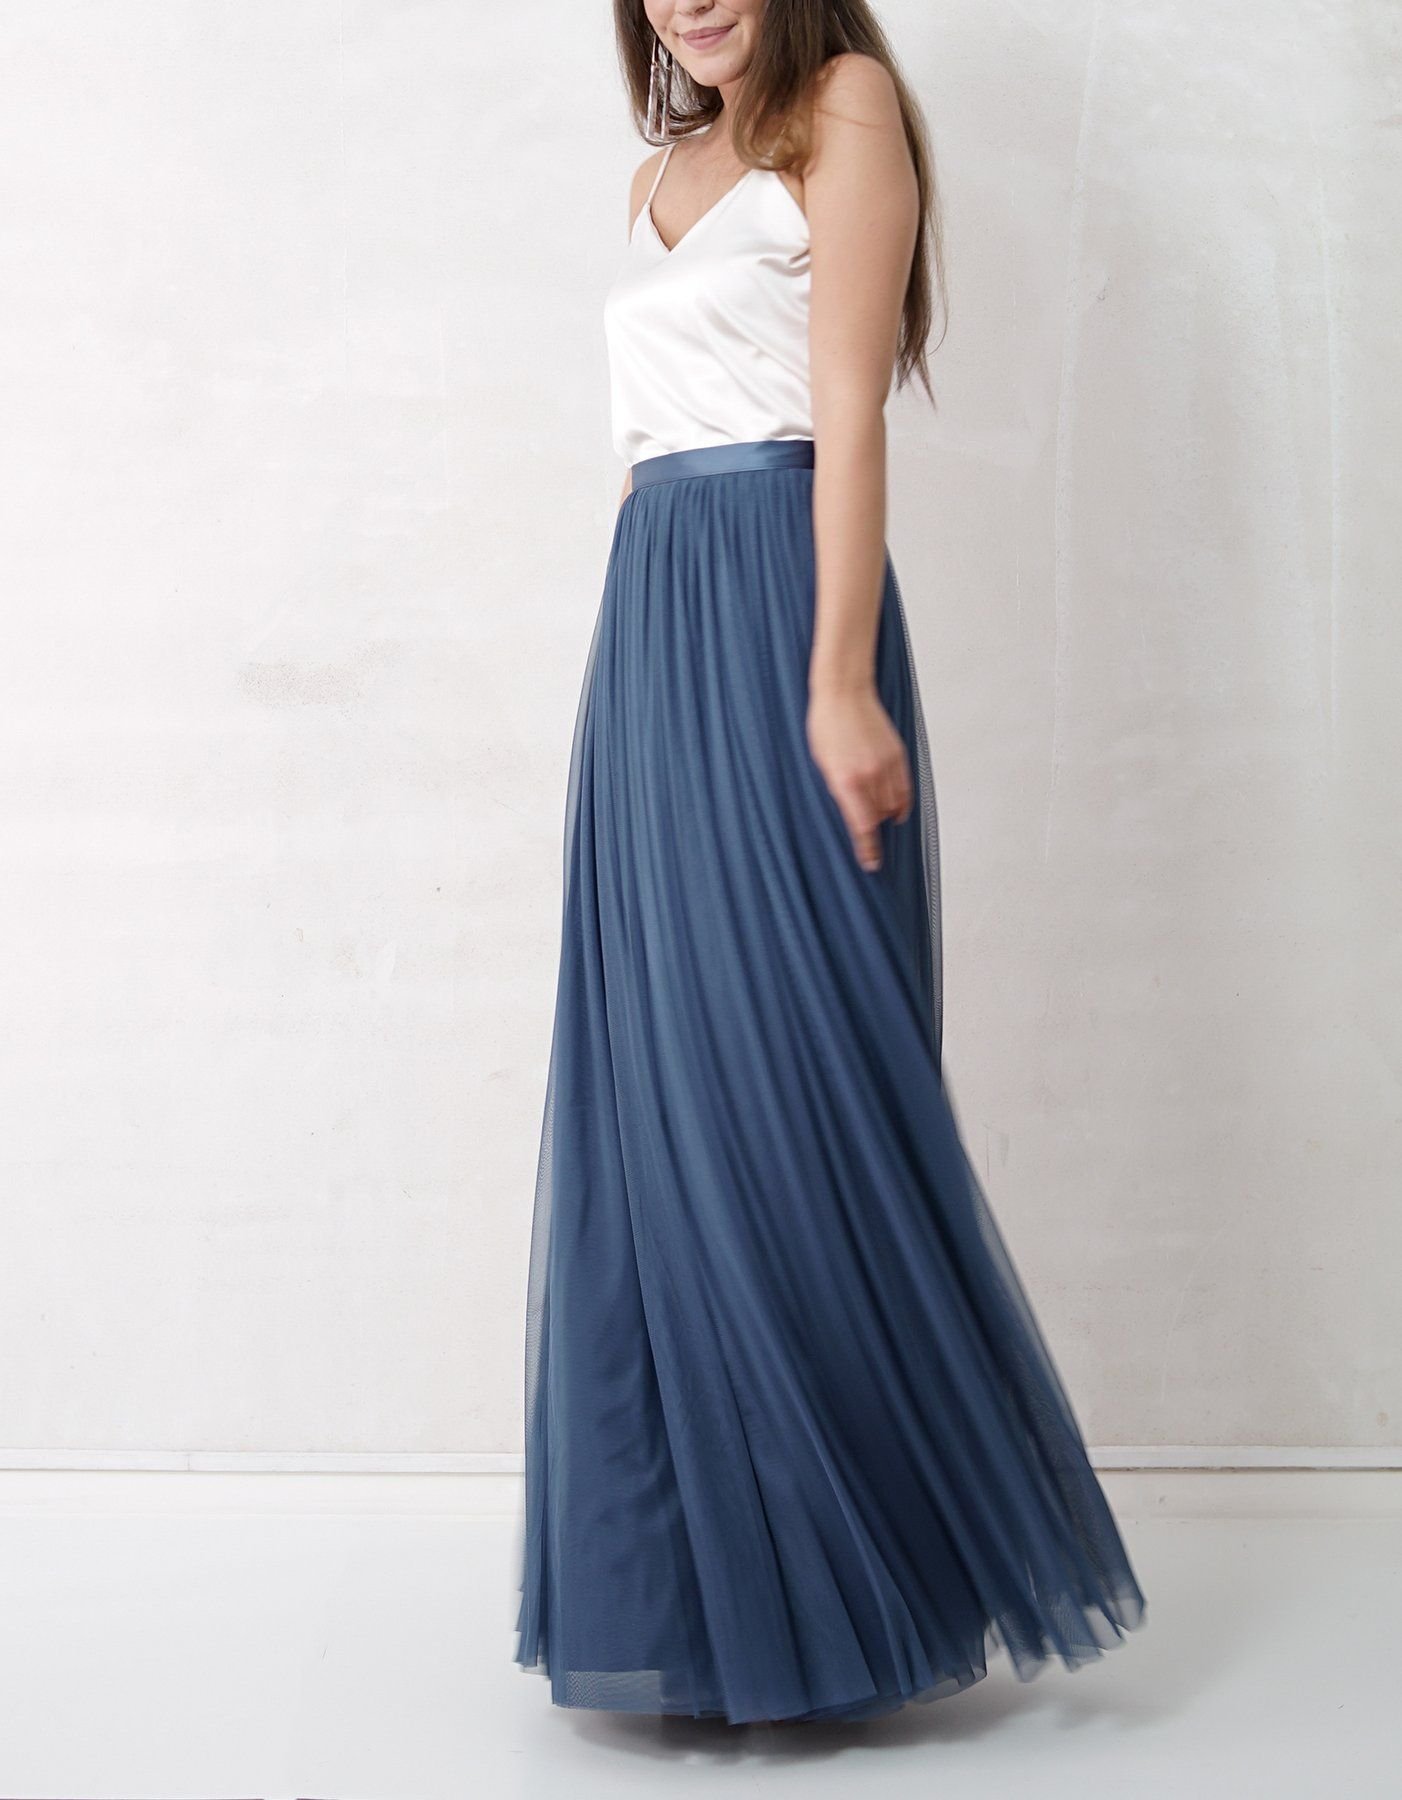 neu: constant love tüll rock lang blau braut hochzeitskleid